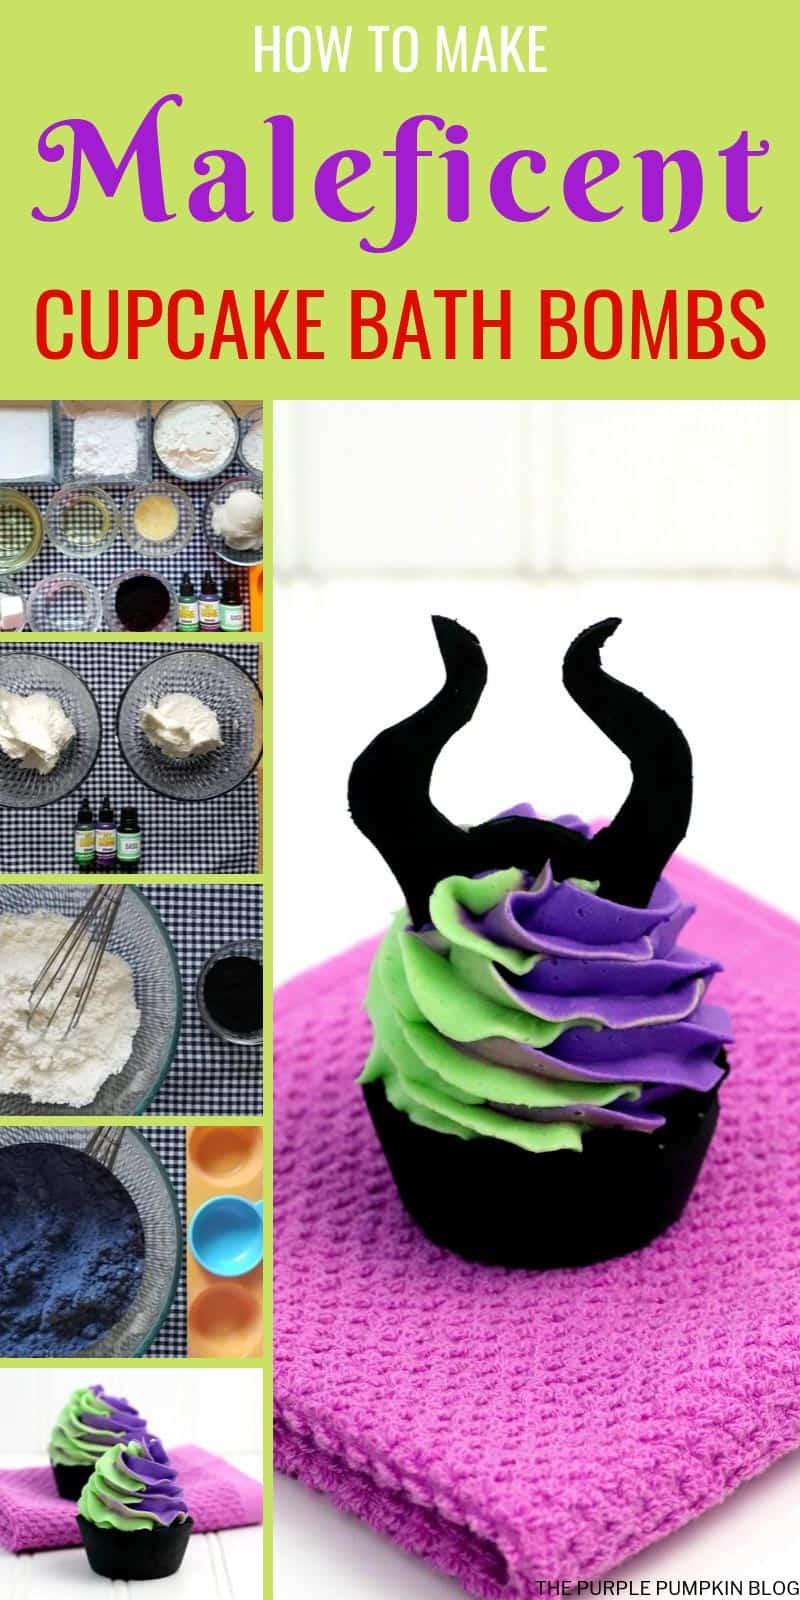 How to make Maleficent cupcake bath bombs